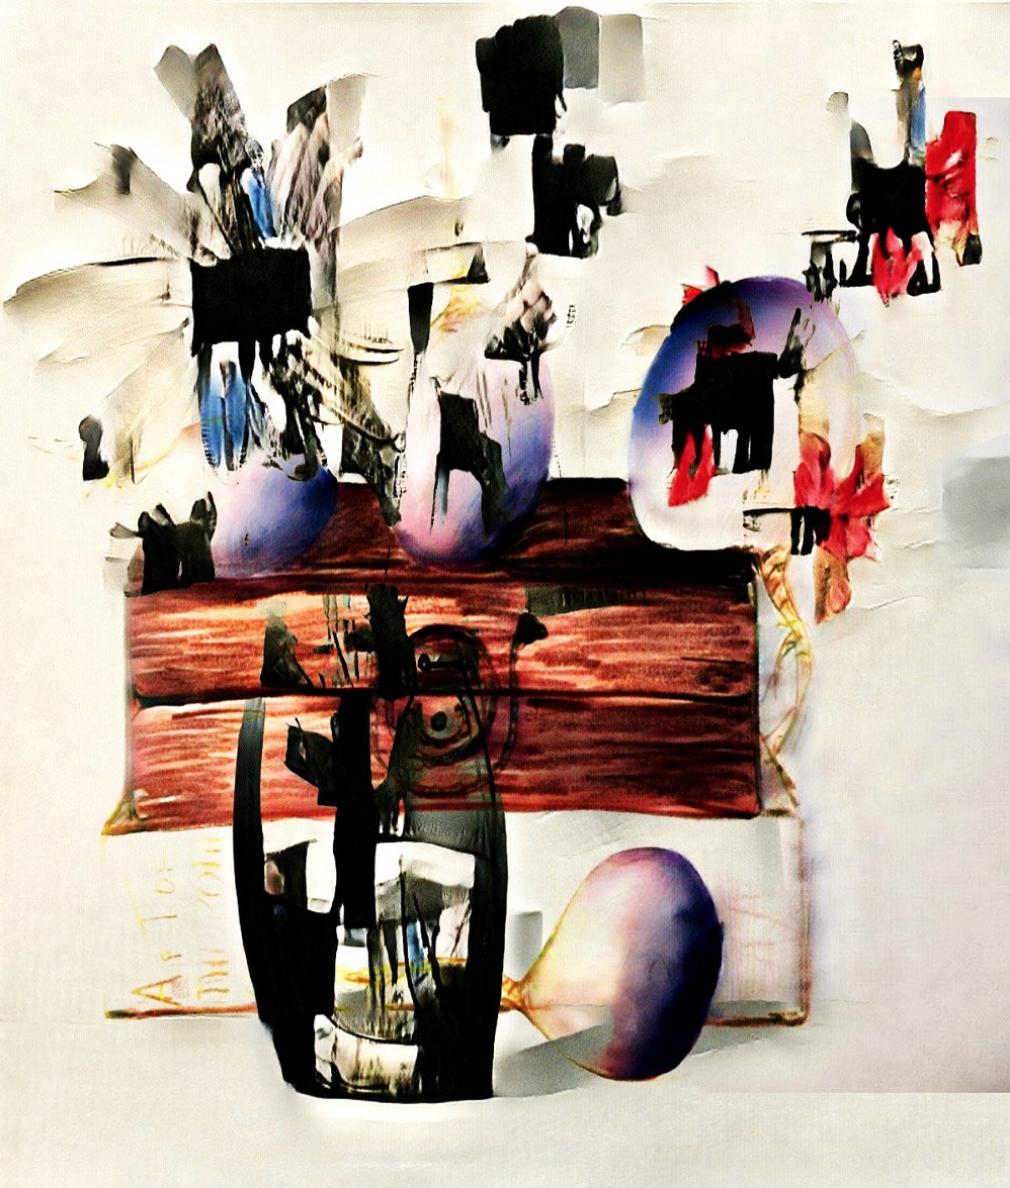 Am I Dali yet?,  Helena Sarin, 2018 (Collection of Jeremy Howard)